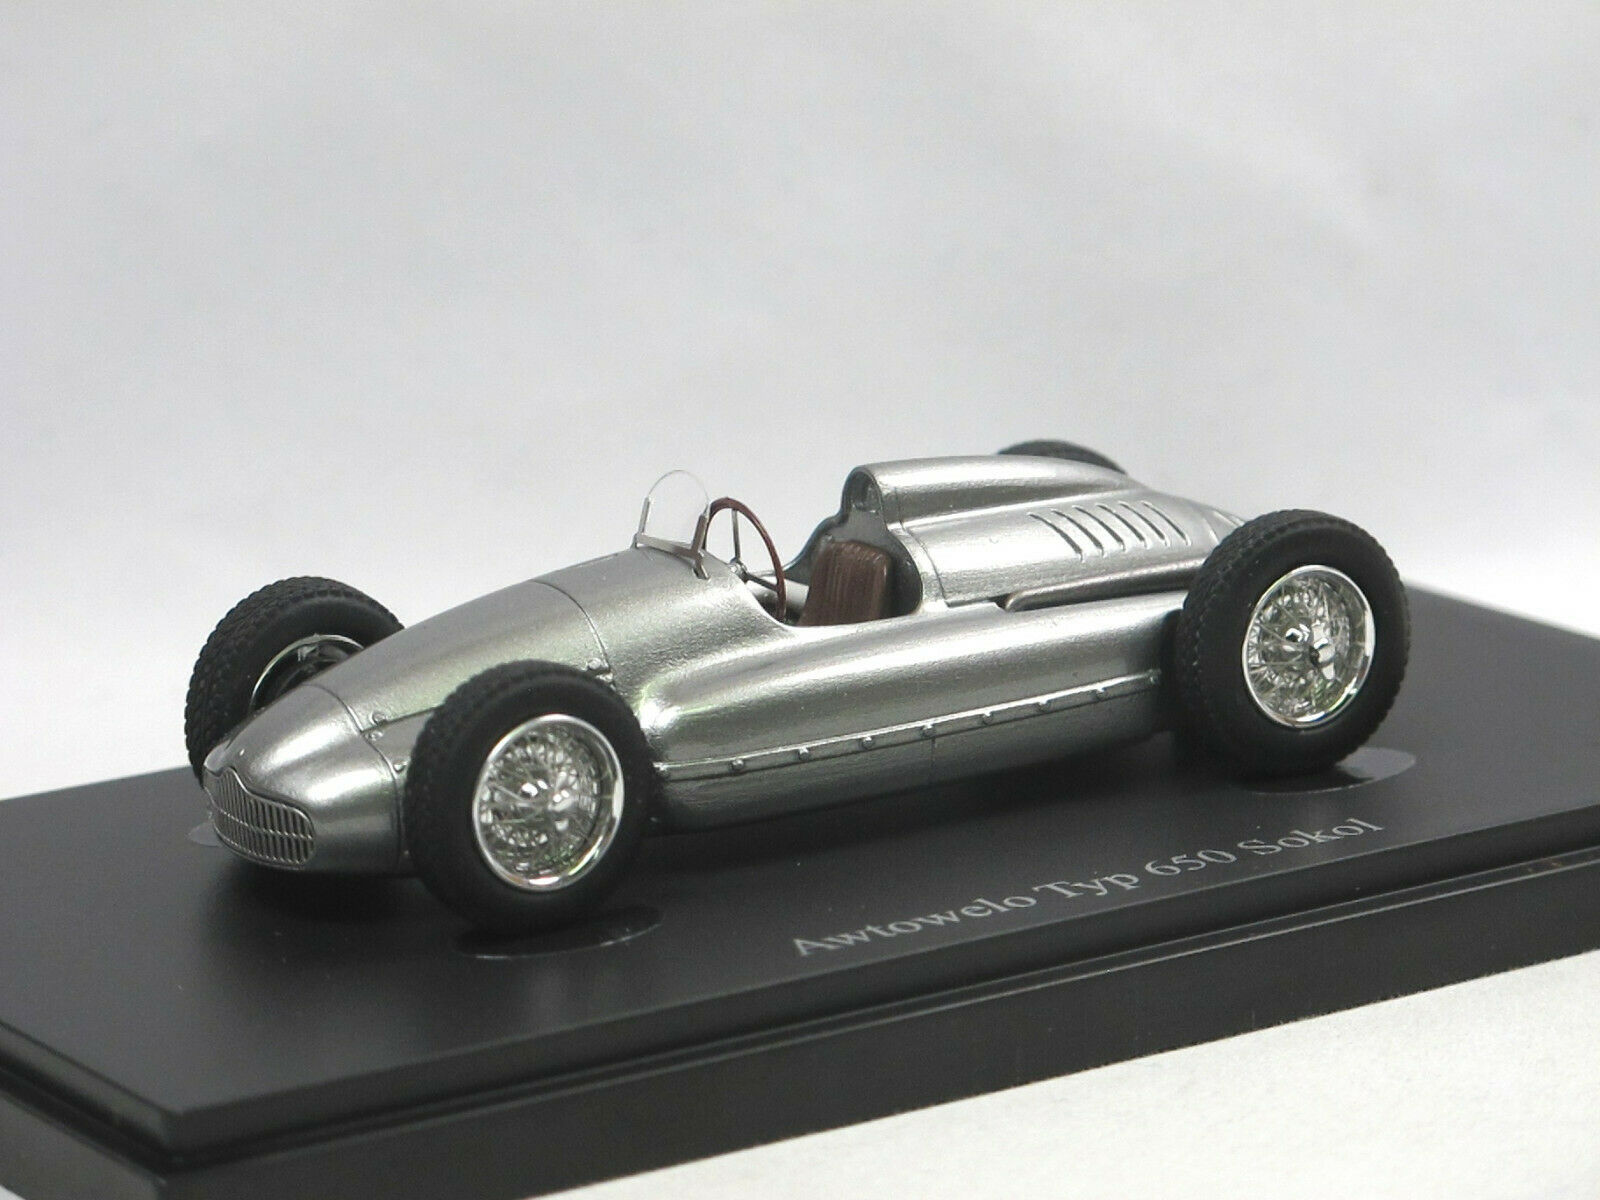 Autocult 07014 - 1952 awtowelo tipo 650 Sokol formula 2 auto da corsa DDR USSR 1:43